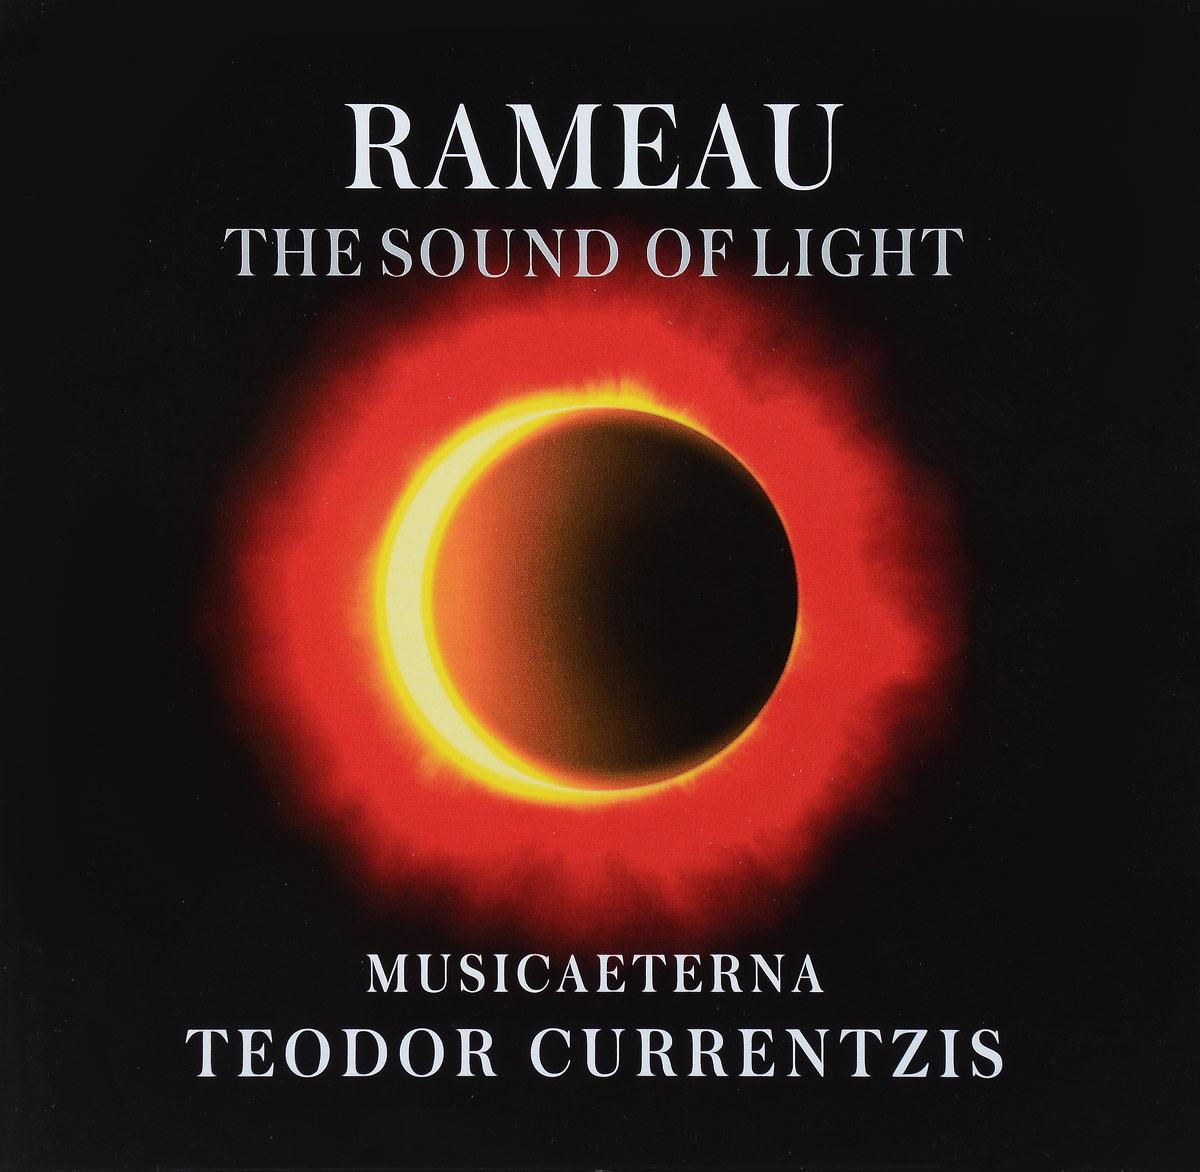 Теодор Курентзис Teodor Currentzis. Jean-Philippe Rameau. The Sound Of Light jean philippe bouchaud market microstructure confronting many viewpoints